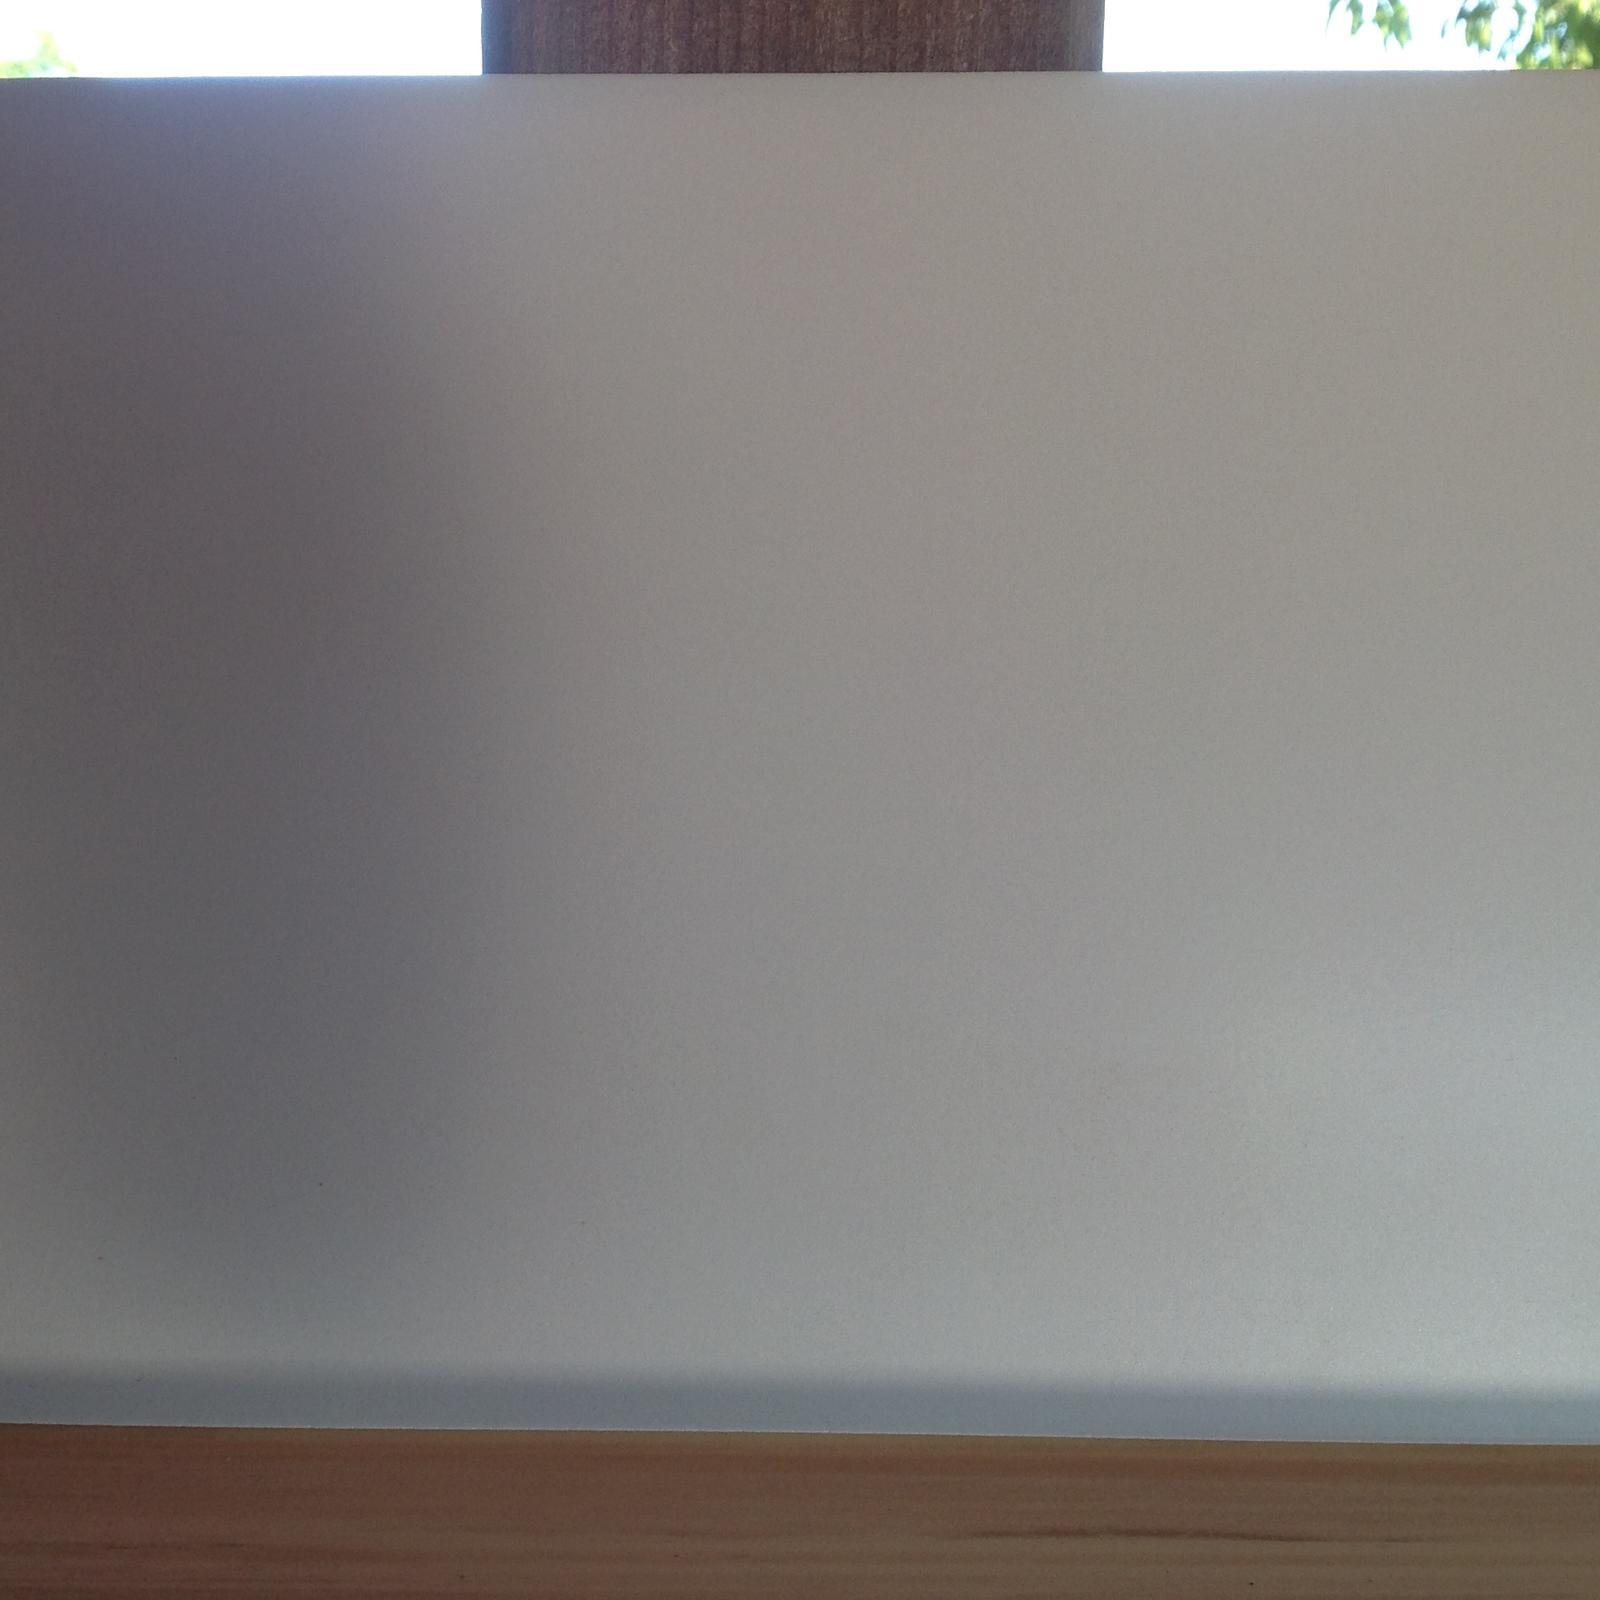 Midian grys sciana 20x60cm seda - Obrázok č. 1